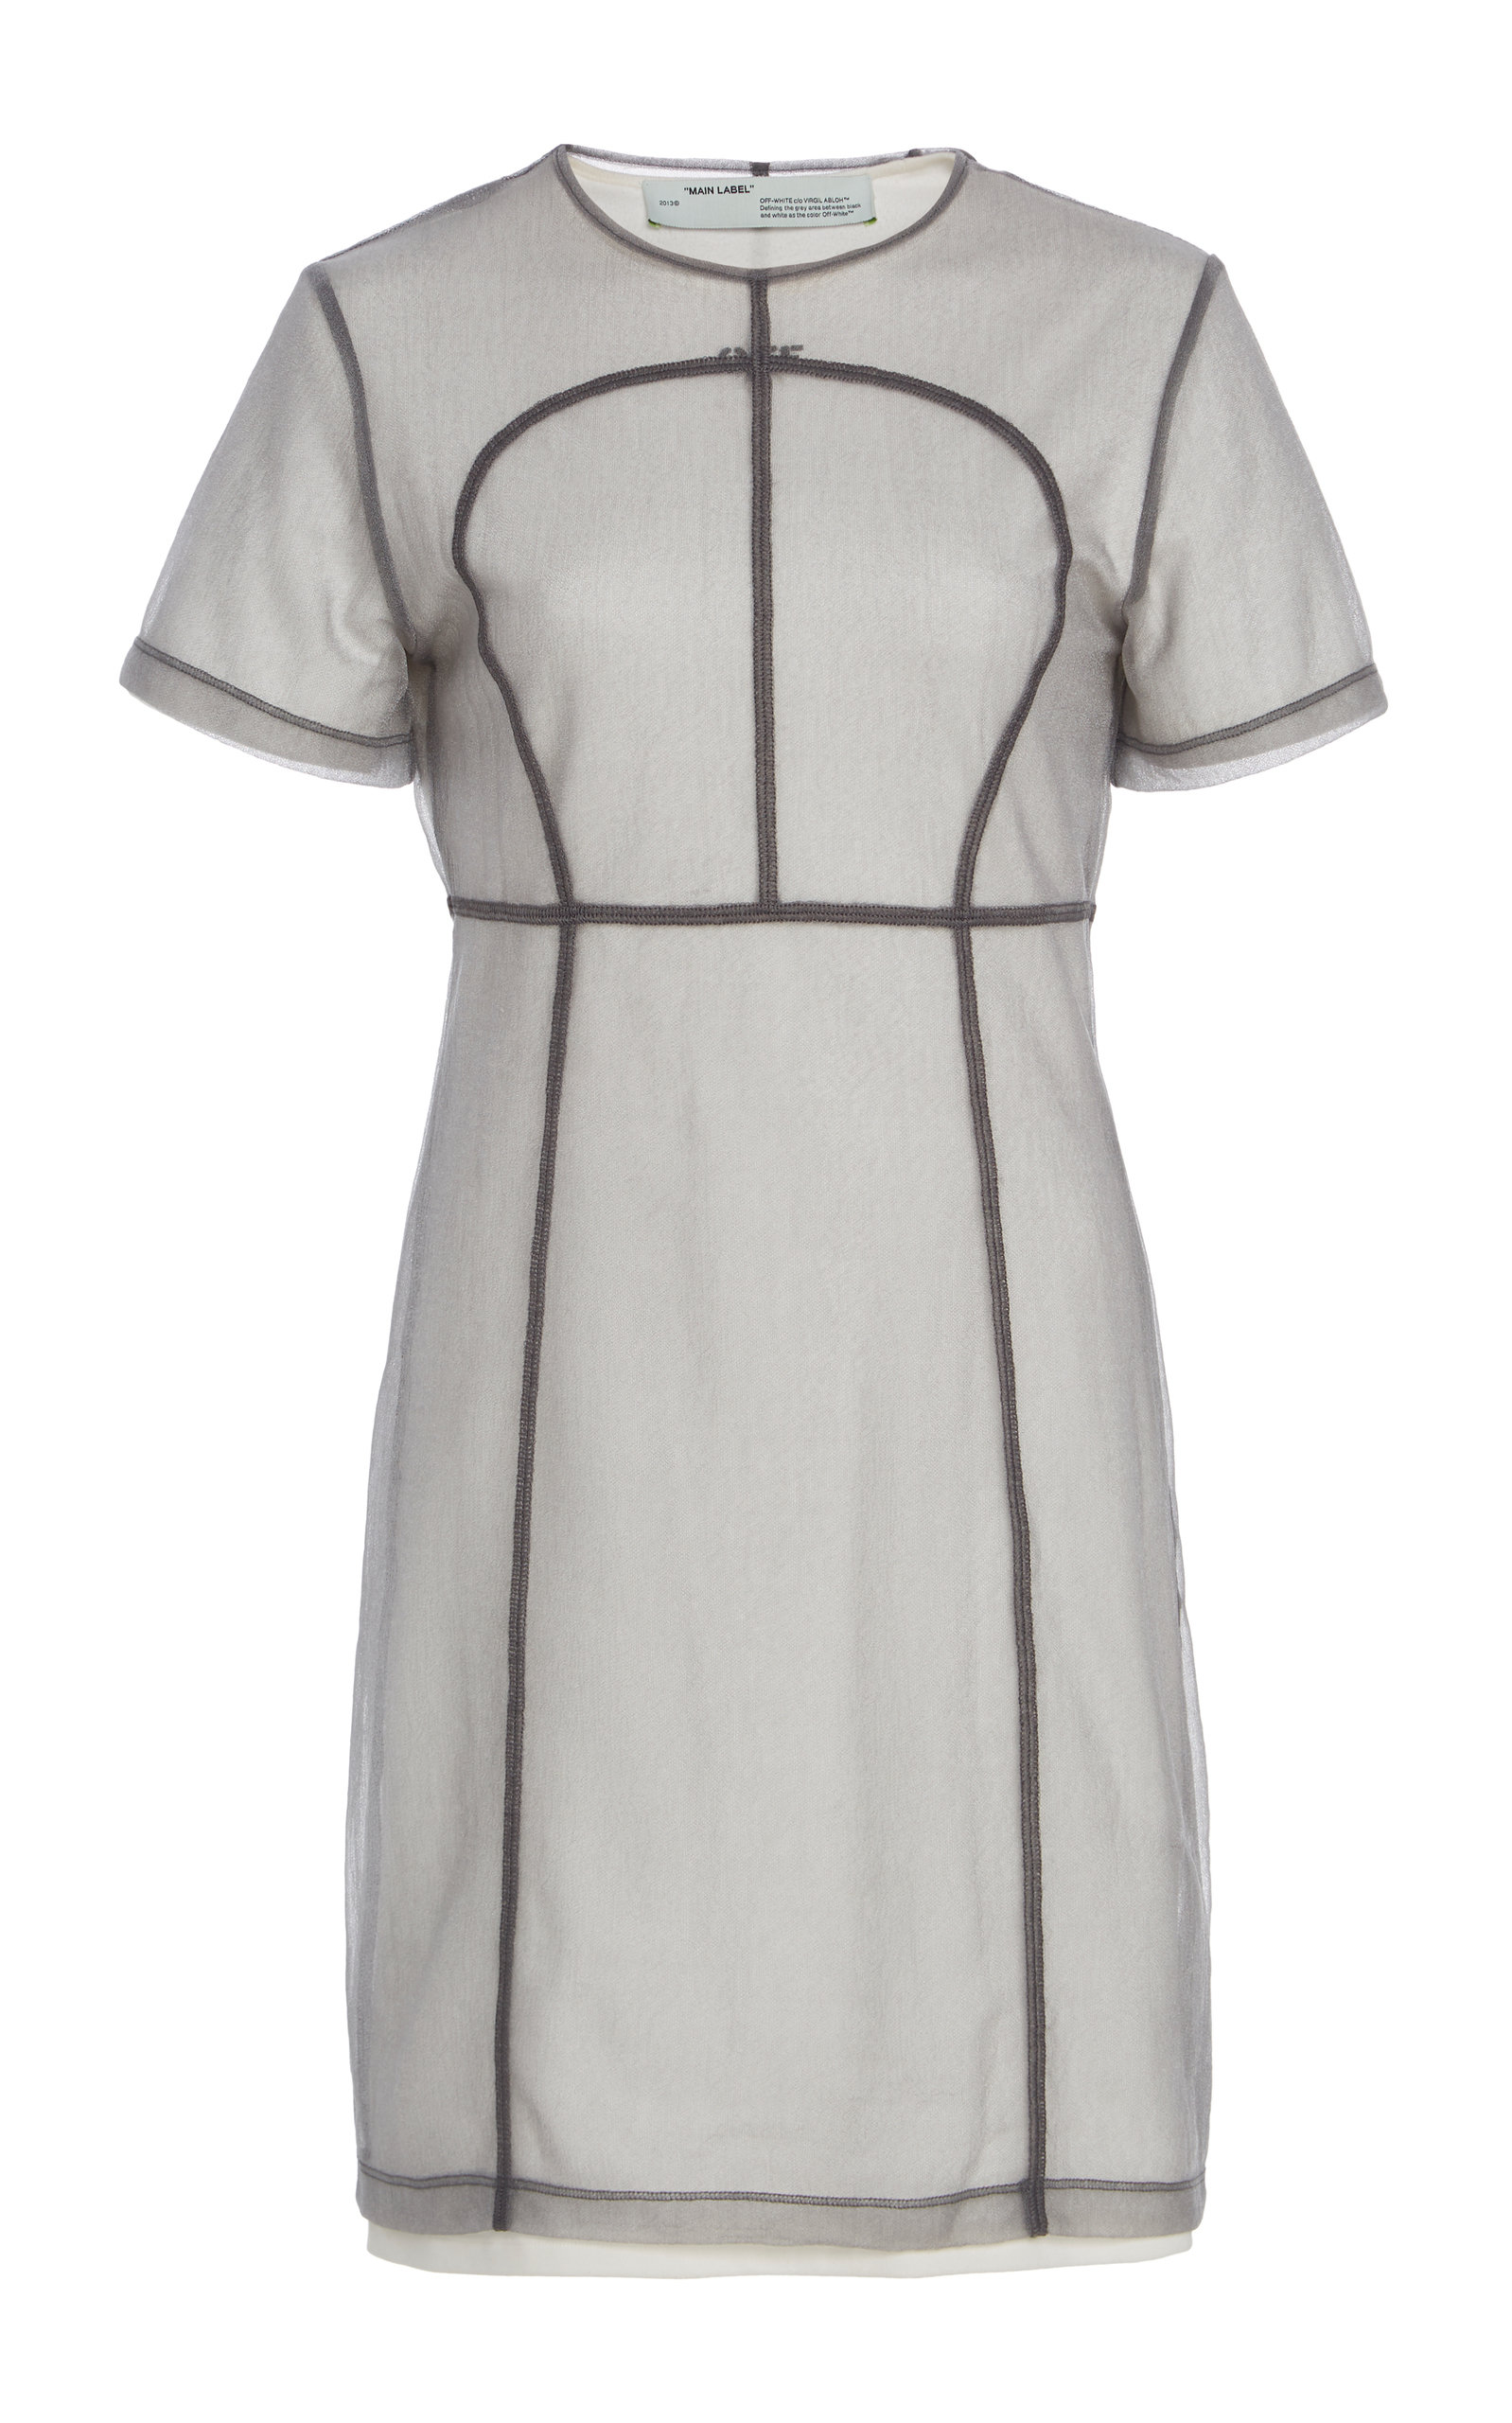 Buy Off-White c/o Virgil Abloh Tulle-Overlay Seamed Mini Dress online, shop Off-White c/o Virgil Abloh at the best price